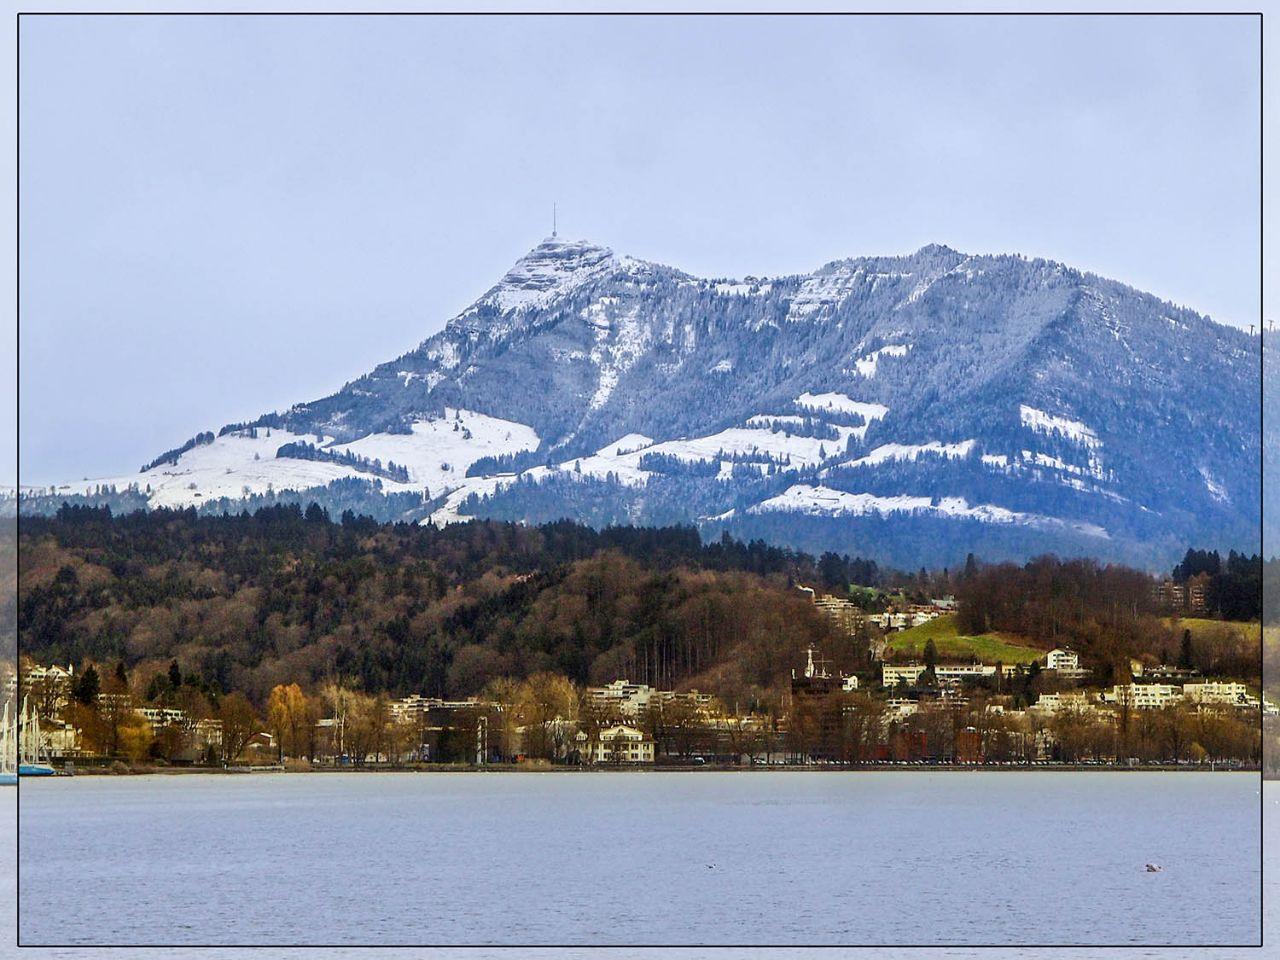 Дорога, озеро и лев Люцерн, Швейцария